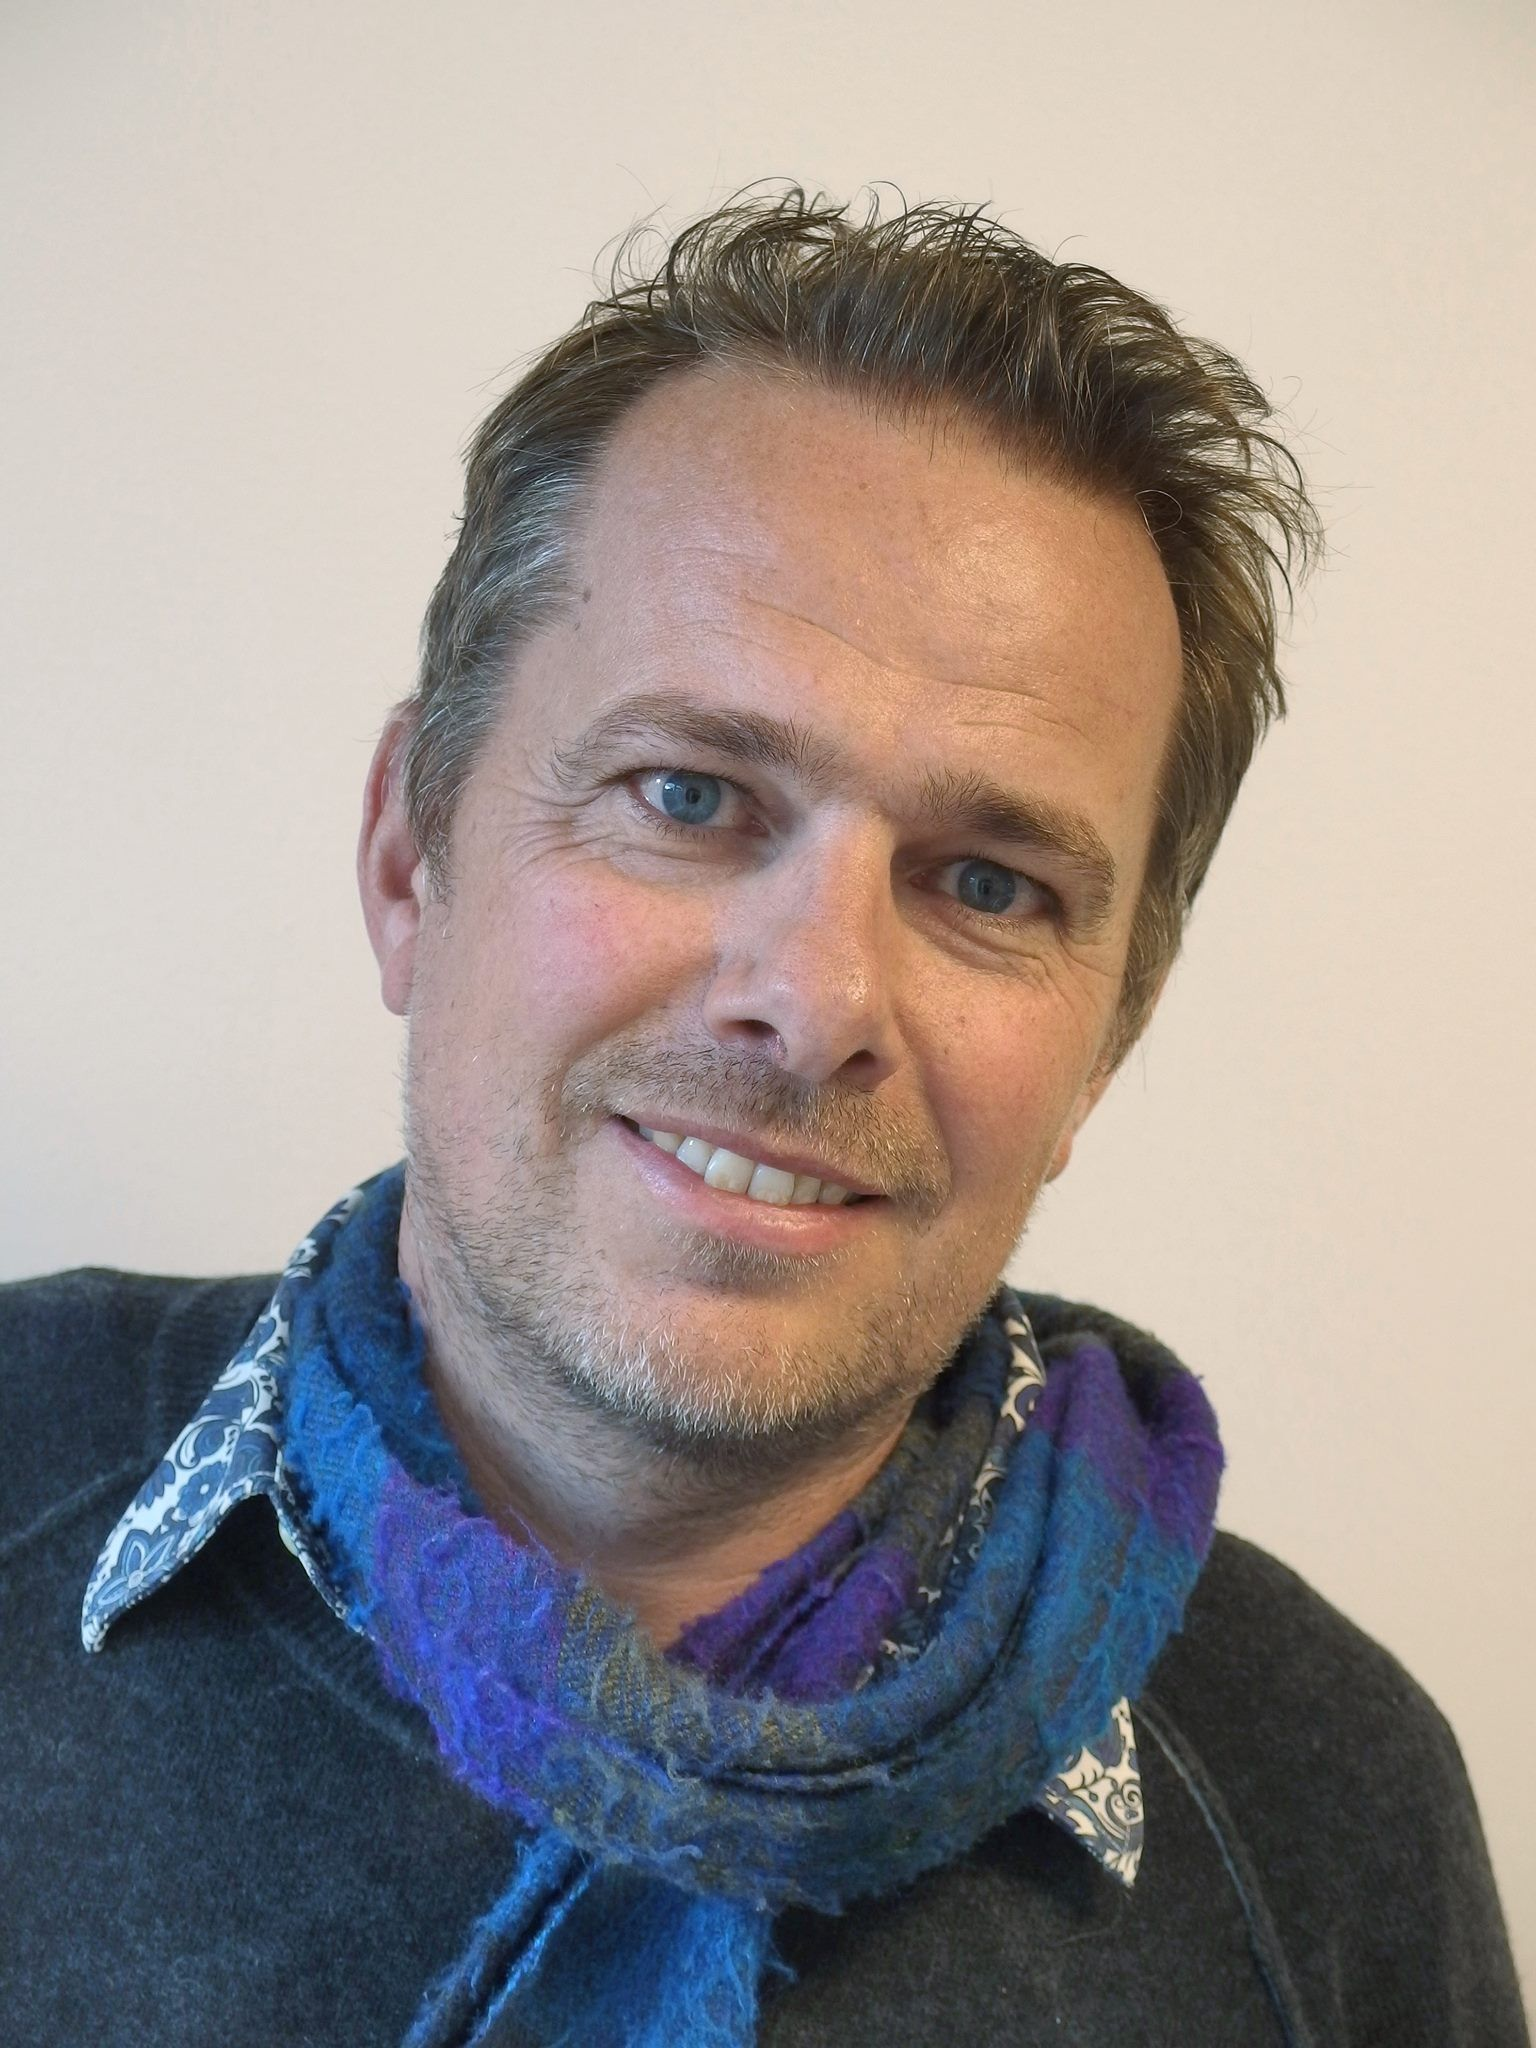 OVERRASKET: Øystein Hage, redaktør i Fiskeribladet Fiskaren. Foto: Fiskeribladet Fiskaren